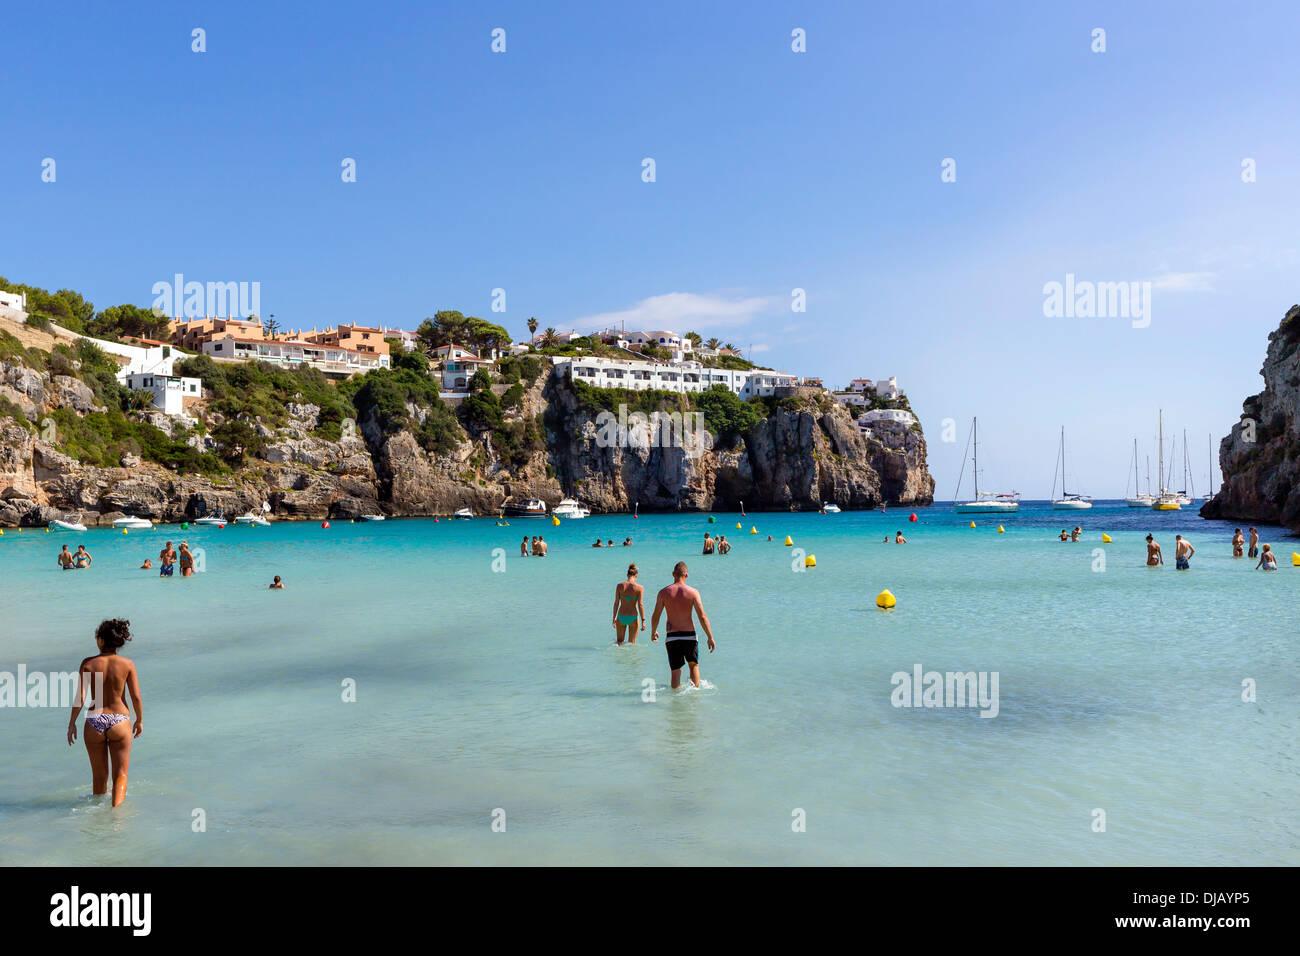 Tourists in the shallow sea, Cala en Porter, Minorca, Balearic Islands, Spain - Stock Image